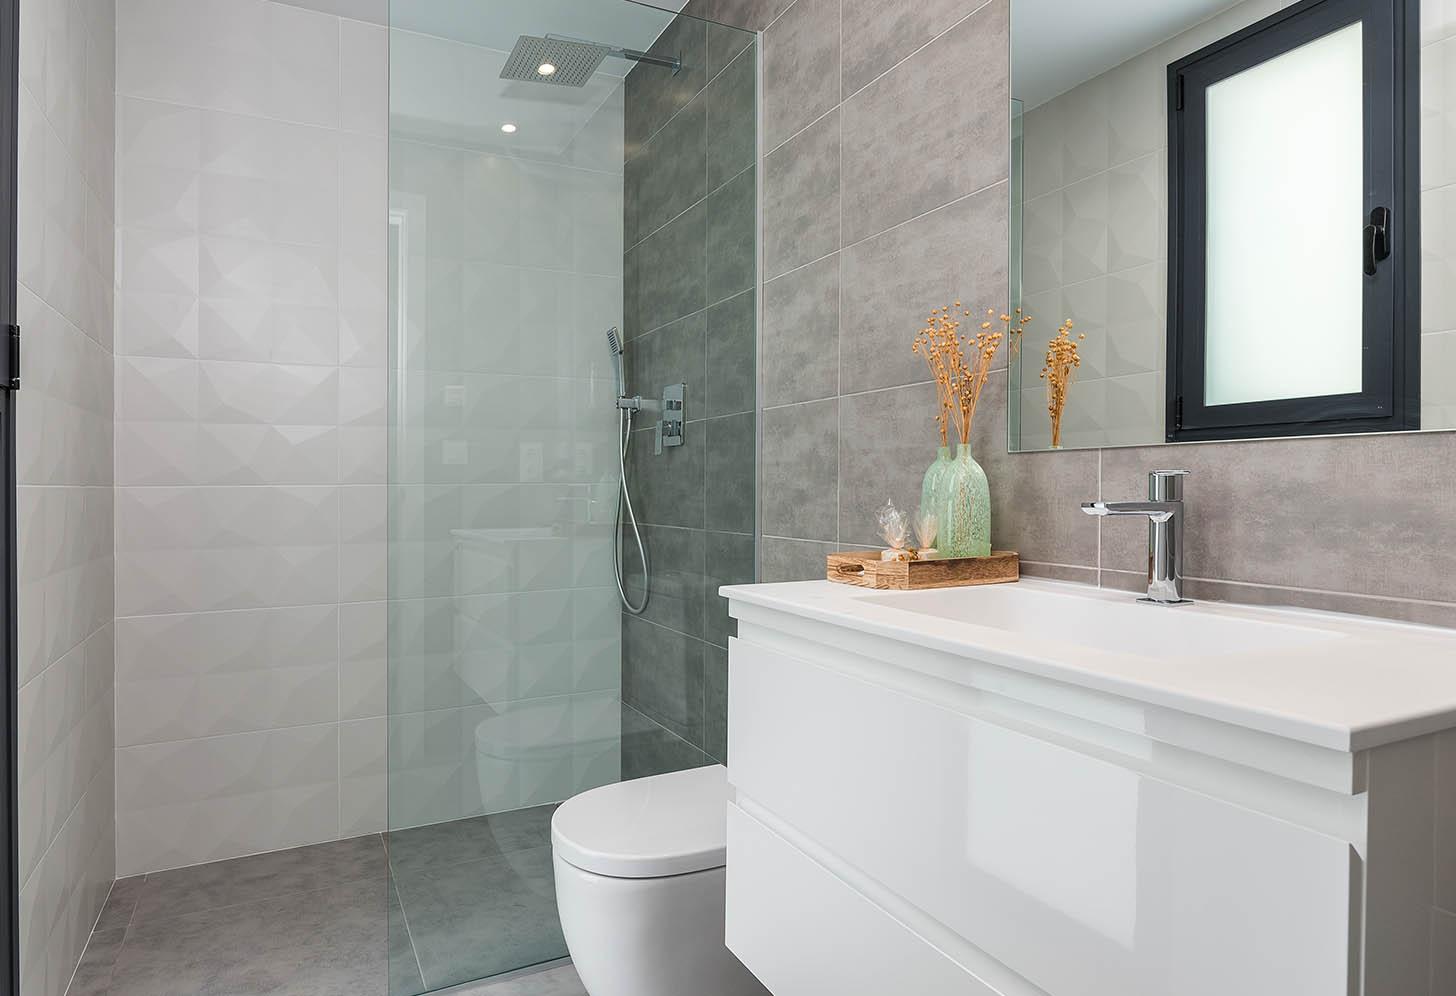 immobilier neuf espagne costa blanca sur alicante dolores salle de bain